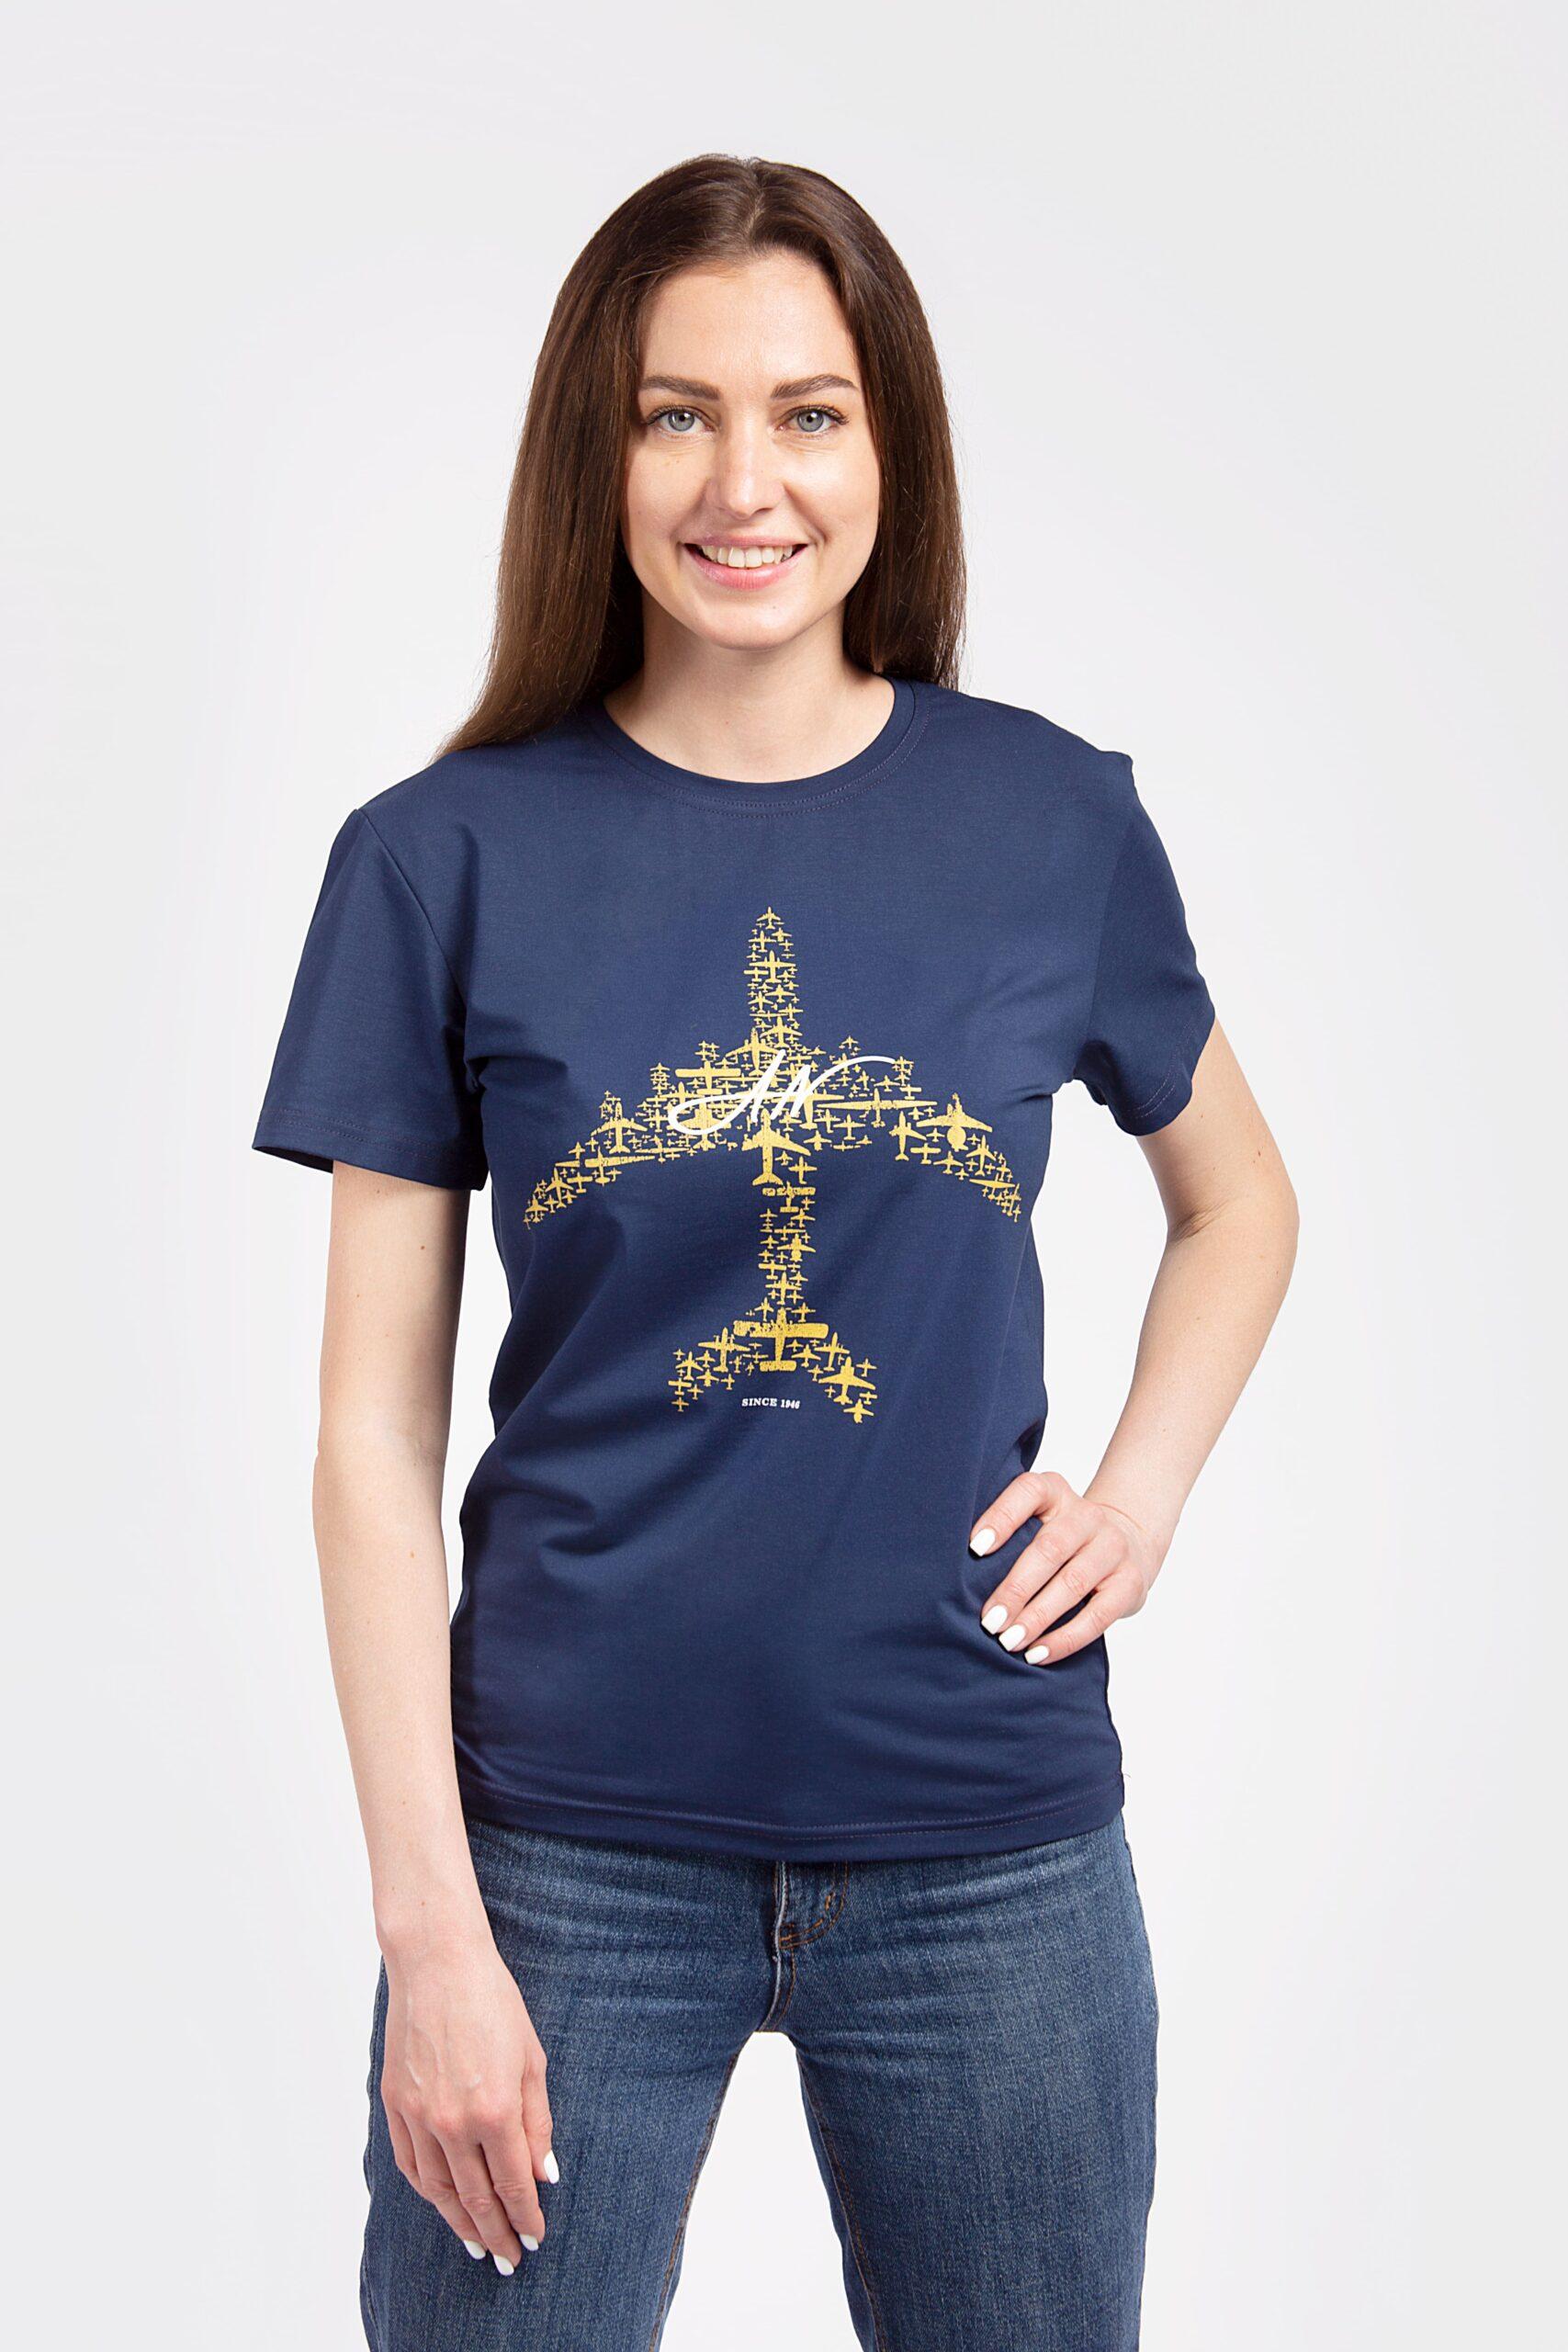 Women's T-Shirt An. The Greatest Hits. Color navy blue. T-shirt celebrates 75th anniversary of Antonov company.